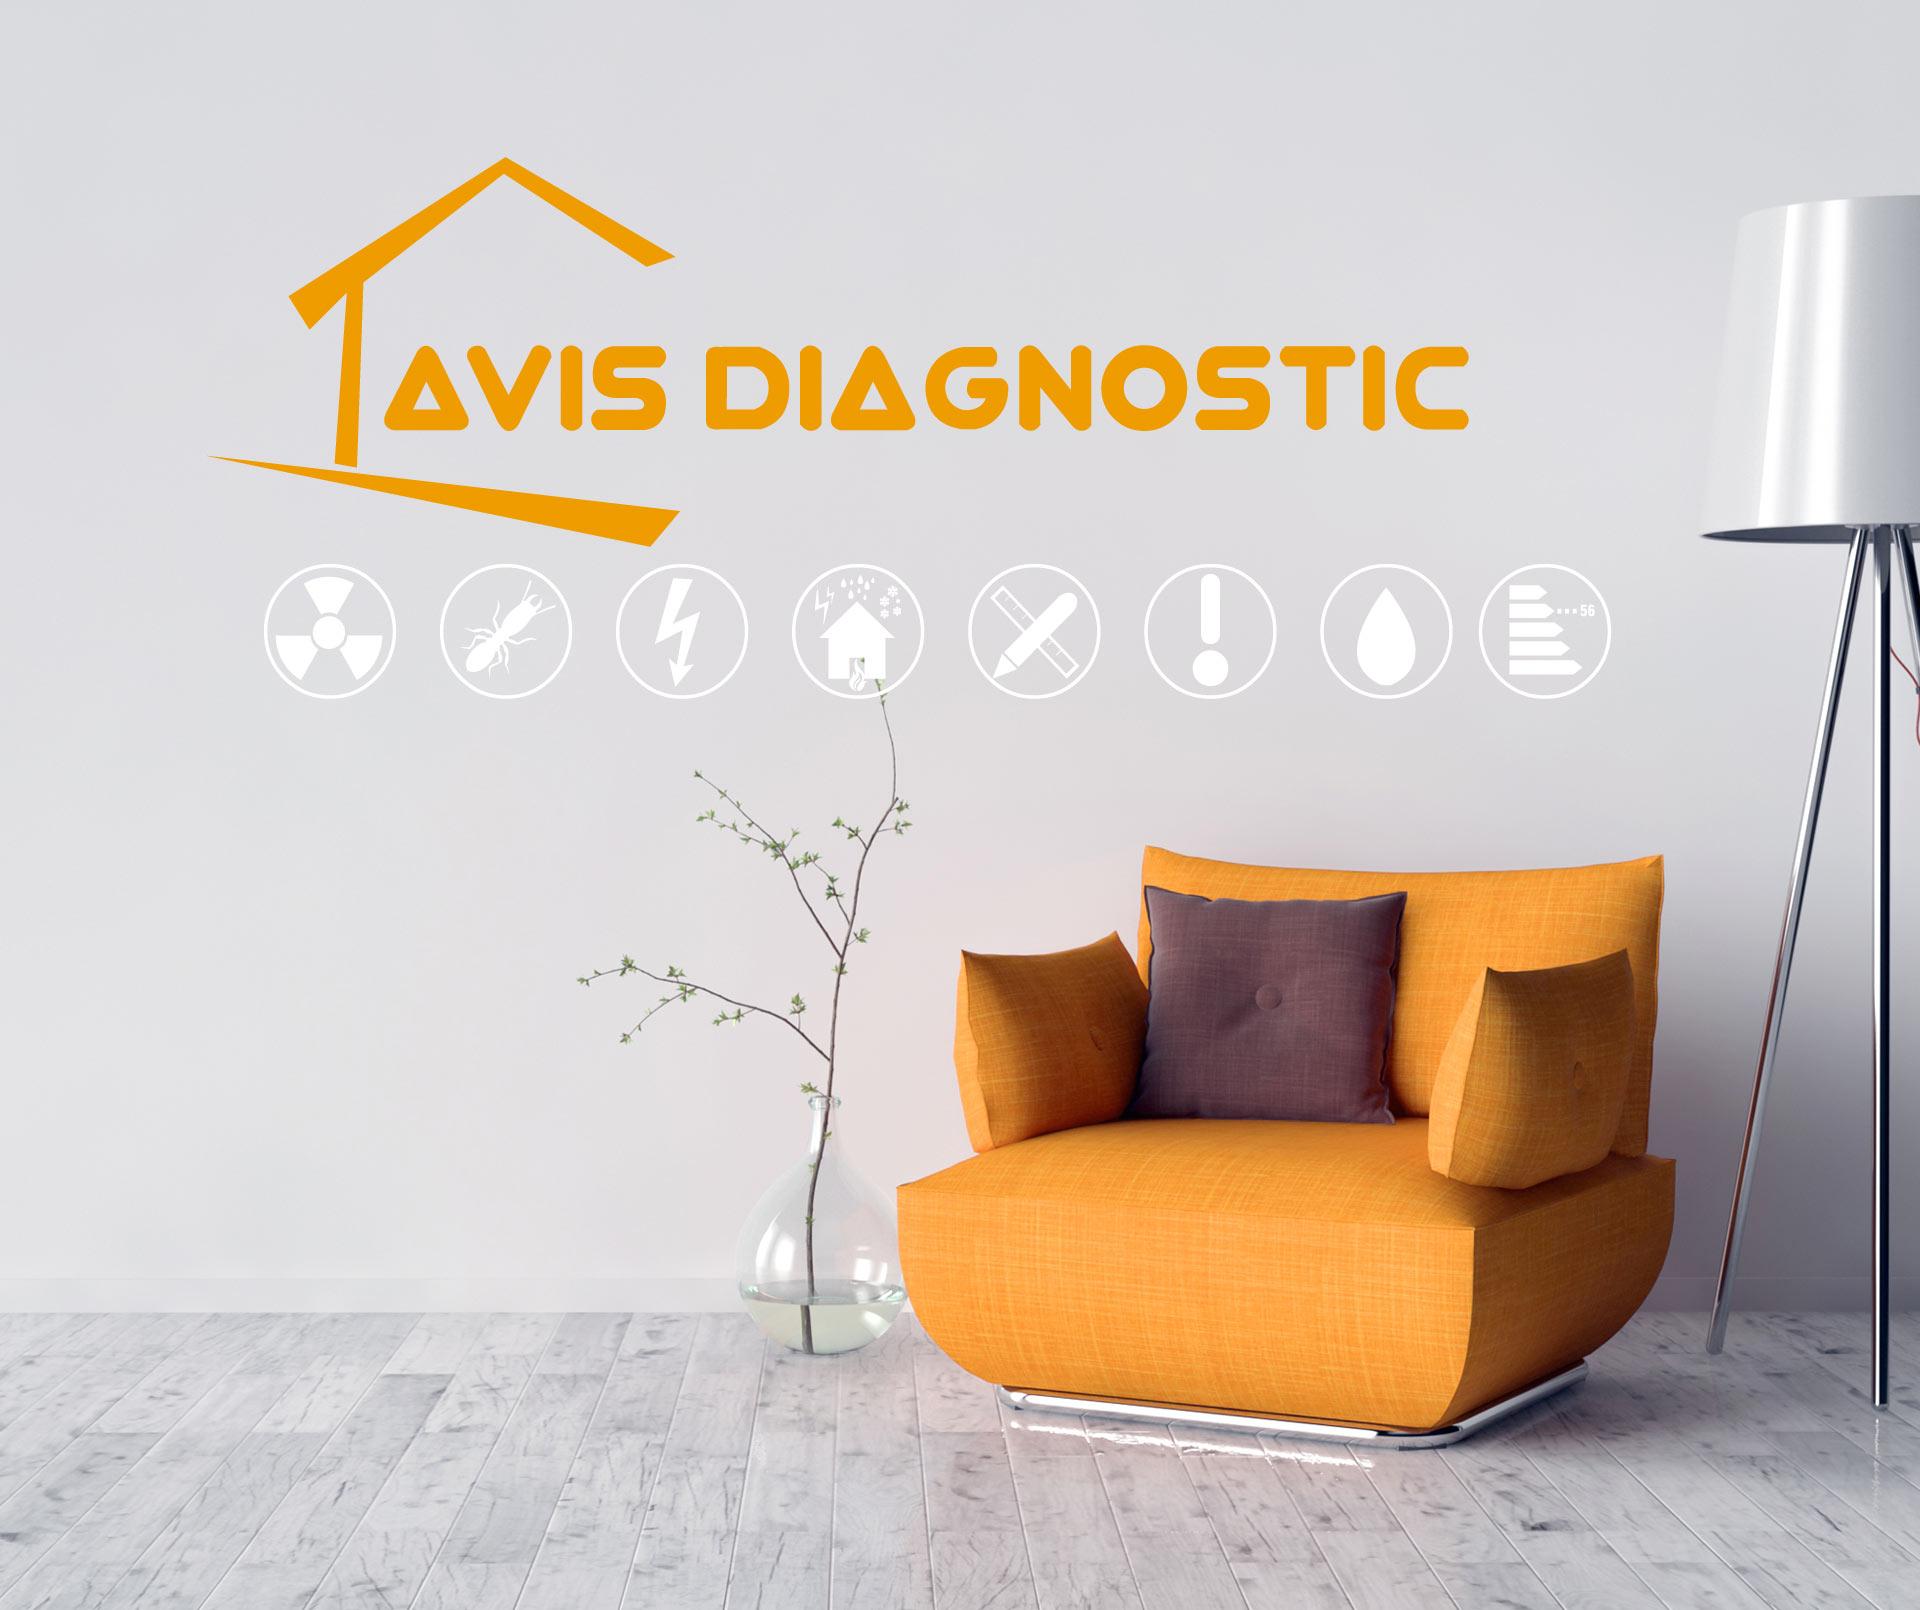 diagnostic immobilier cahors dans le lot 46 cabinet souli. Black Bedroom Furniture Sets. Home Design Ideas